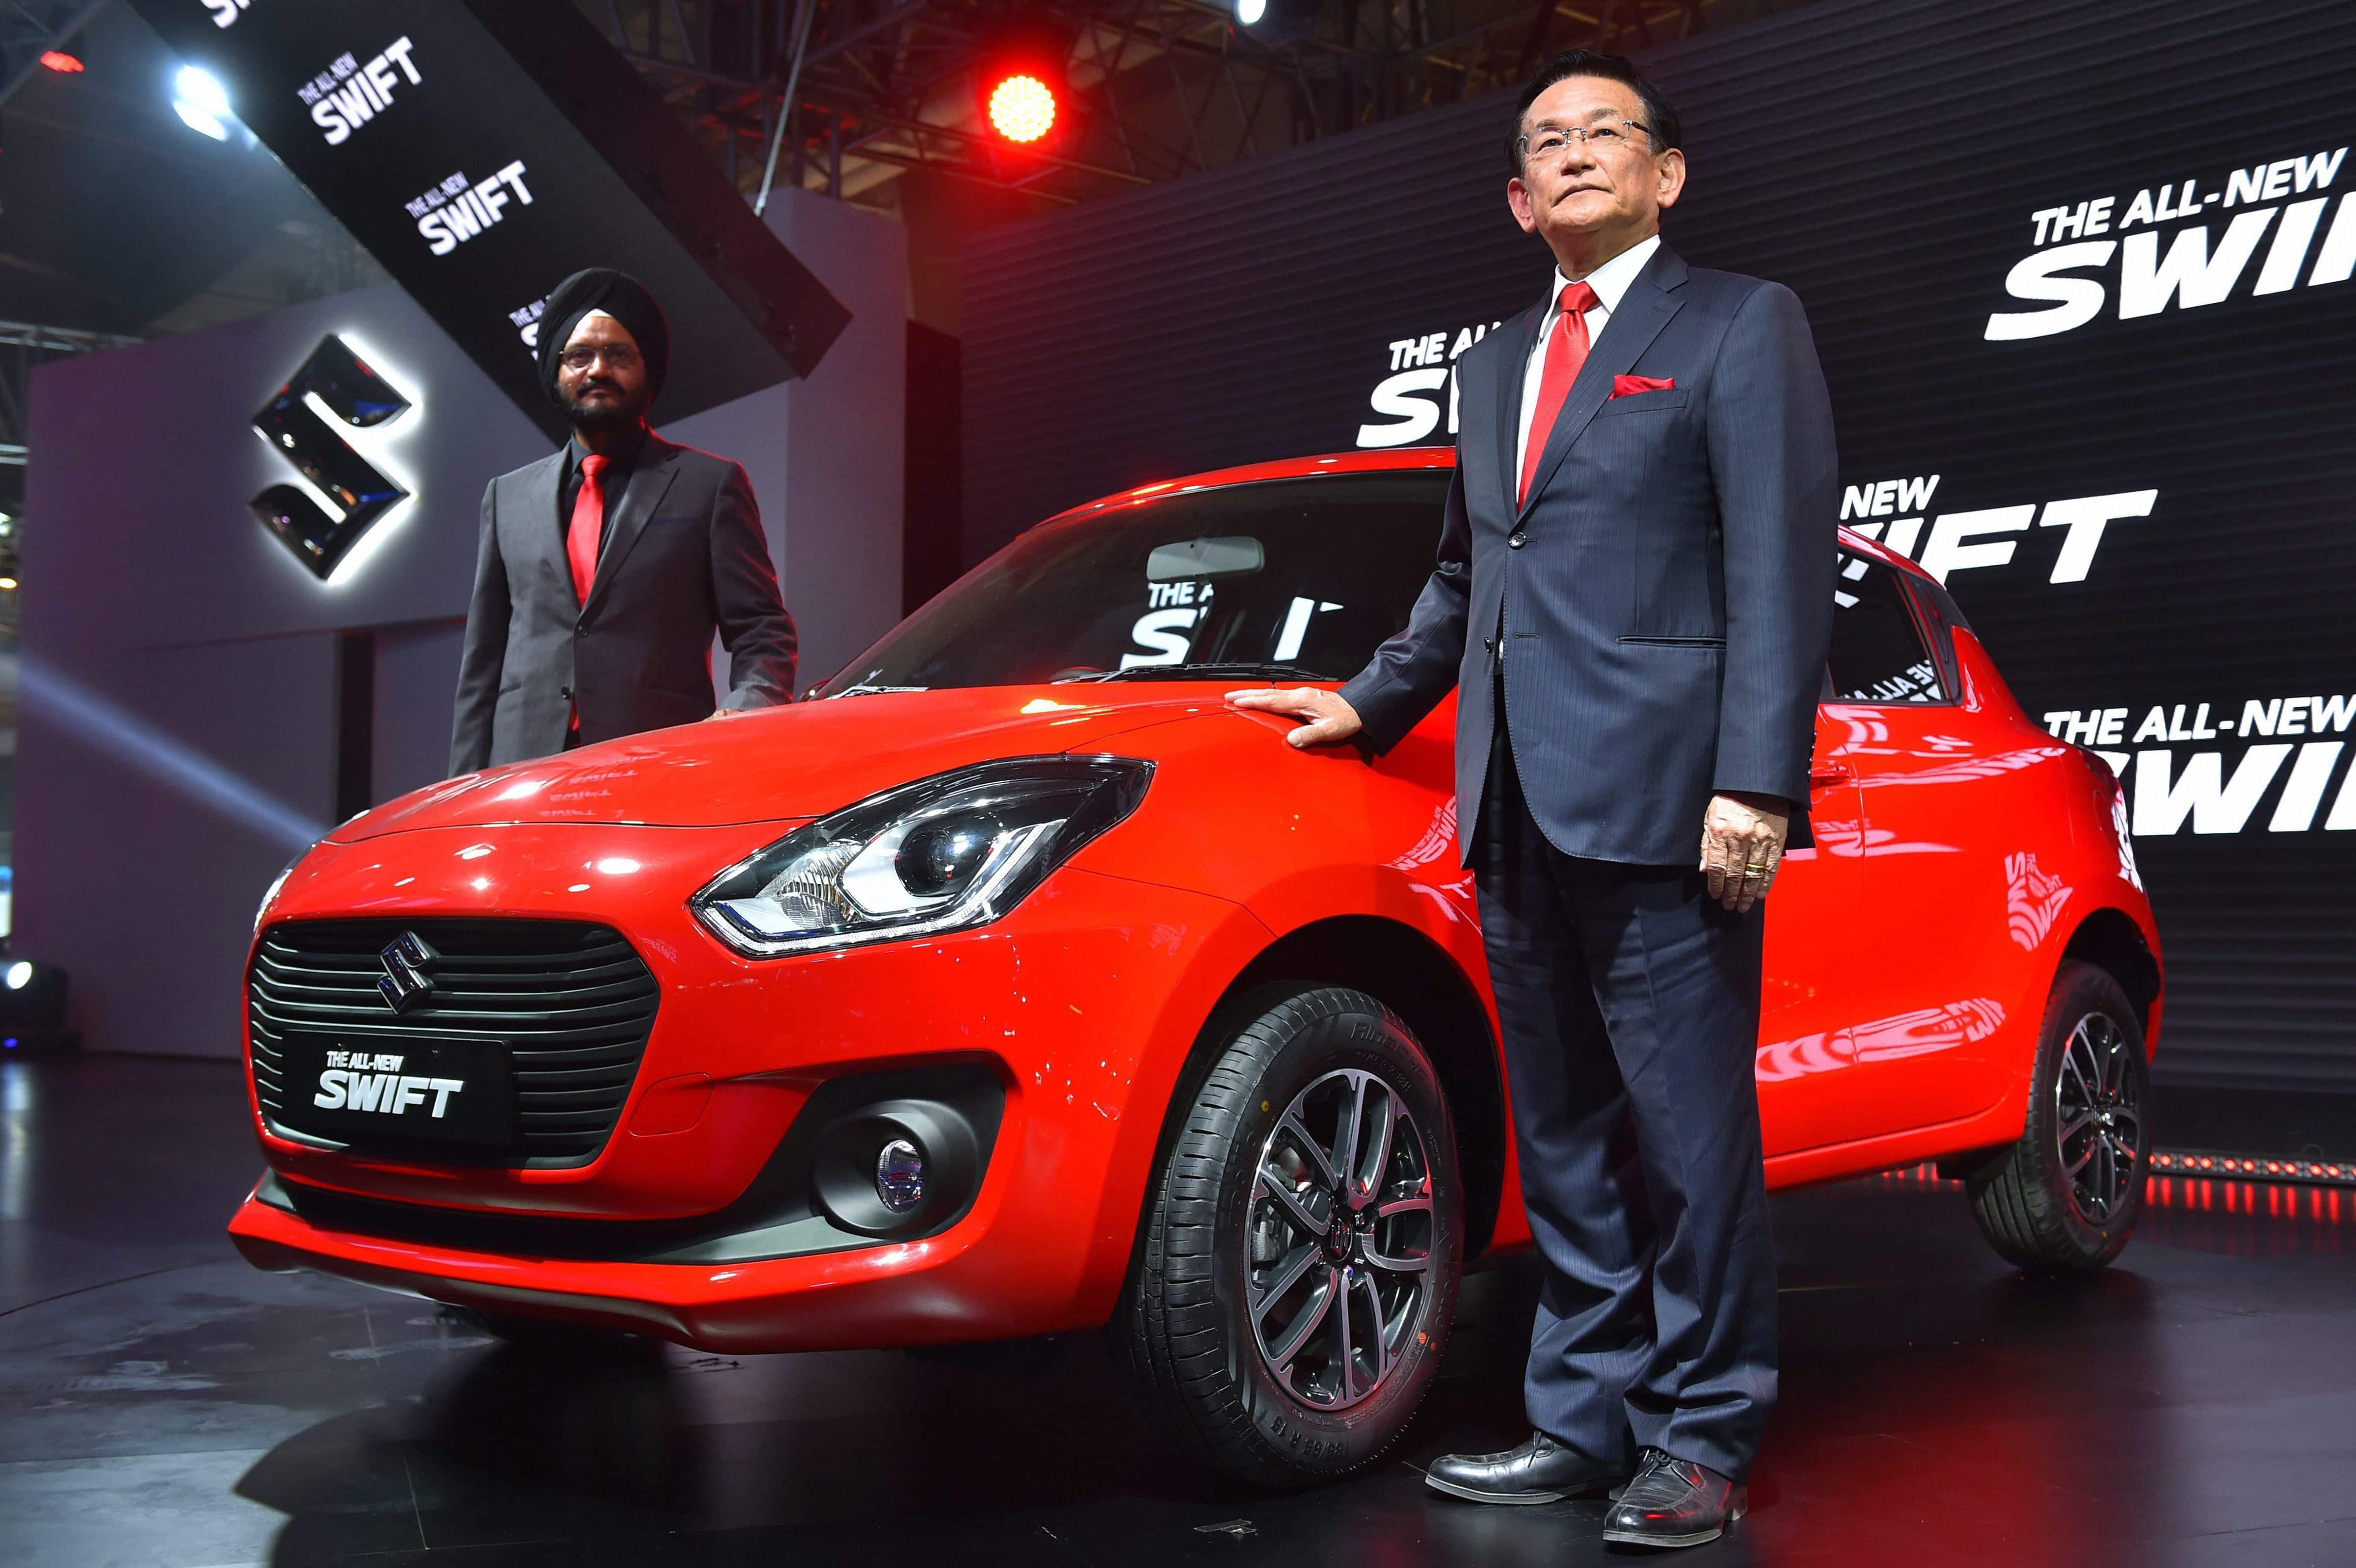 Maruti Suzuki's Managing Director & CEO Kenichi Ayukawa (R) and Senior Executive Director, Marketing and Sales, RS Kalsi showcase the company''s all-new Swift at the Auto Expo 2018 in Greater Noida.  PTI